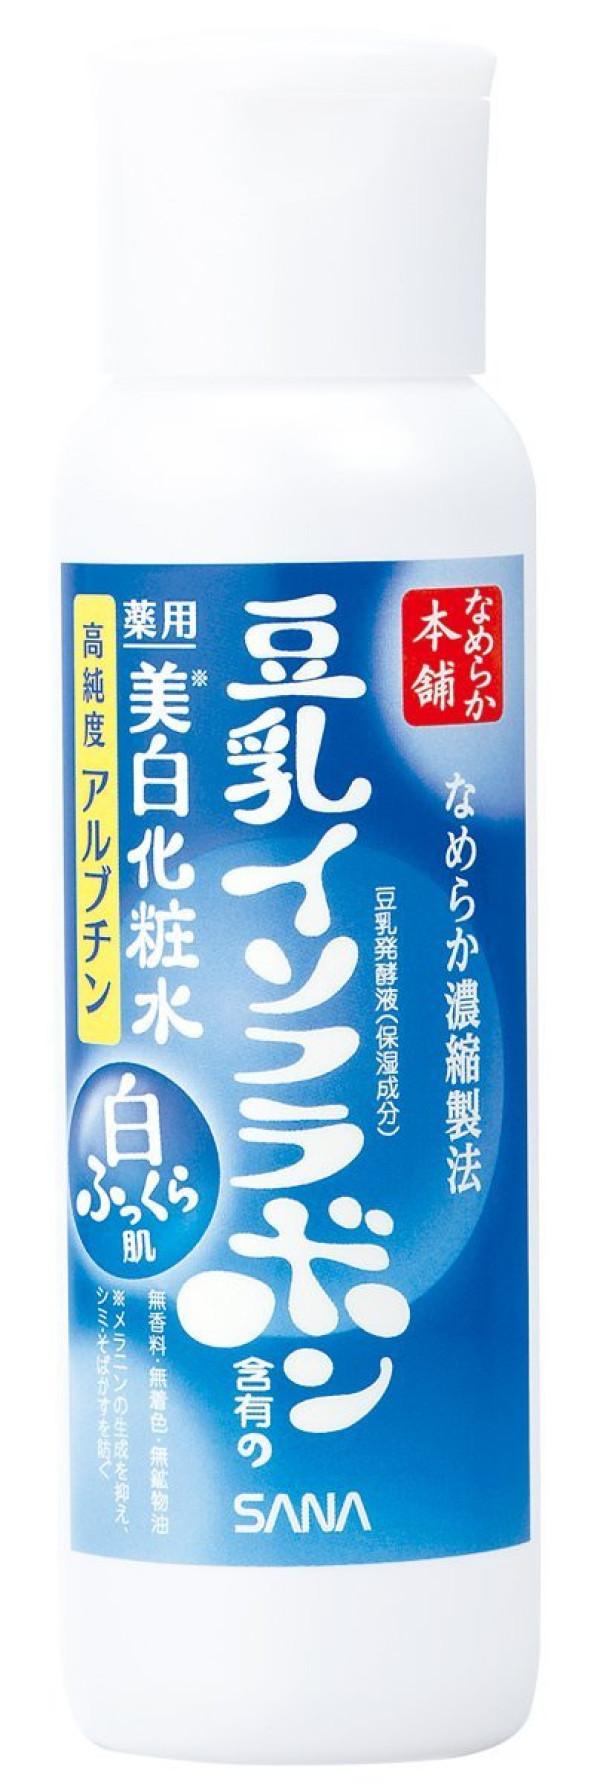 Увлажняющий и отбеливающий лосьон Sana Nameraka Honpo Whitening Lotion